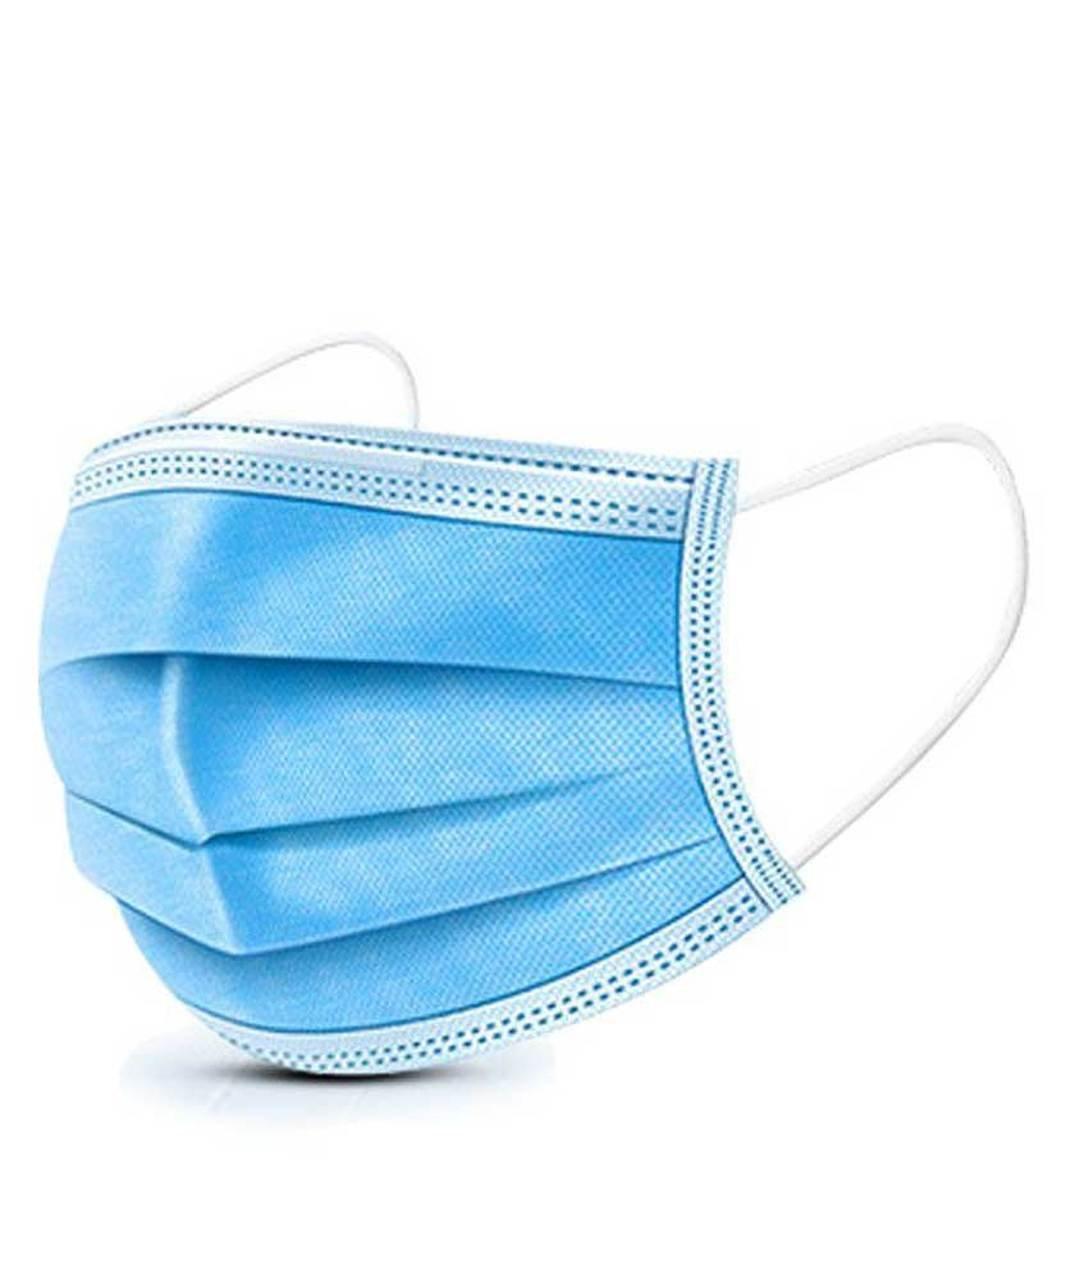 Mundbind, 3-lags N95 Maske - pakke m. 10 stk